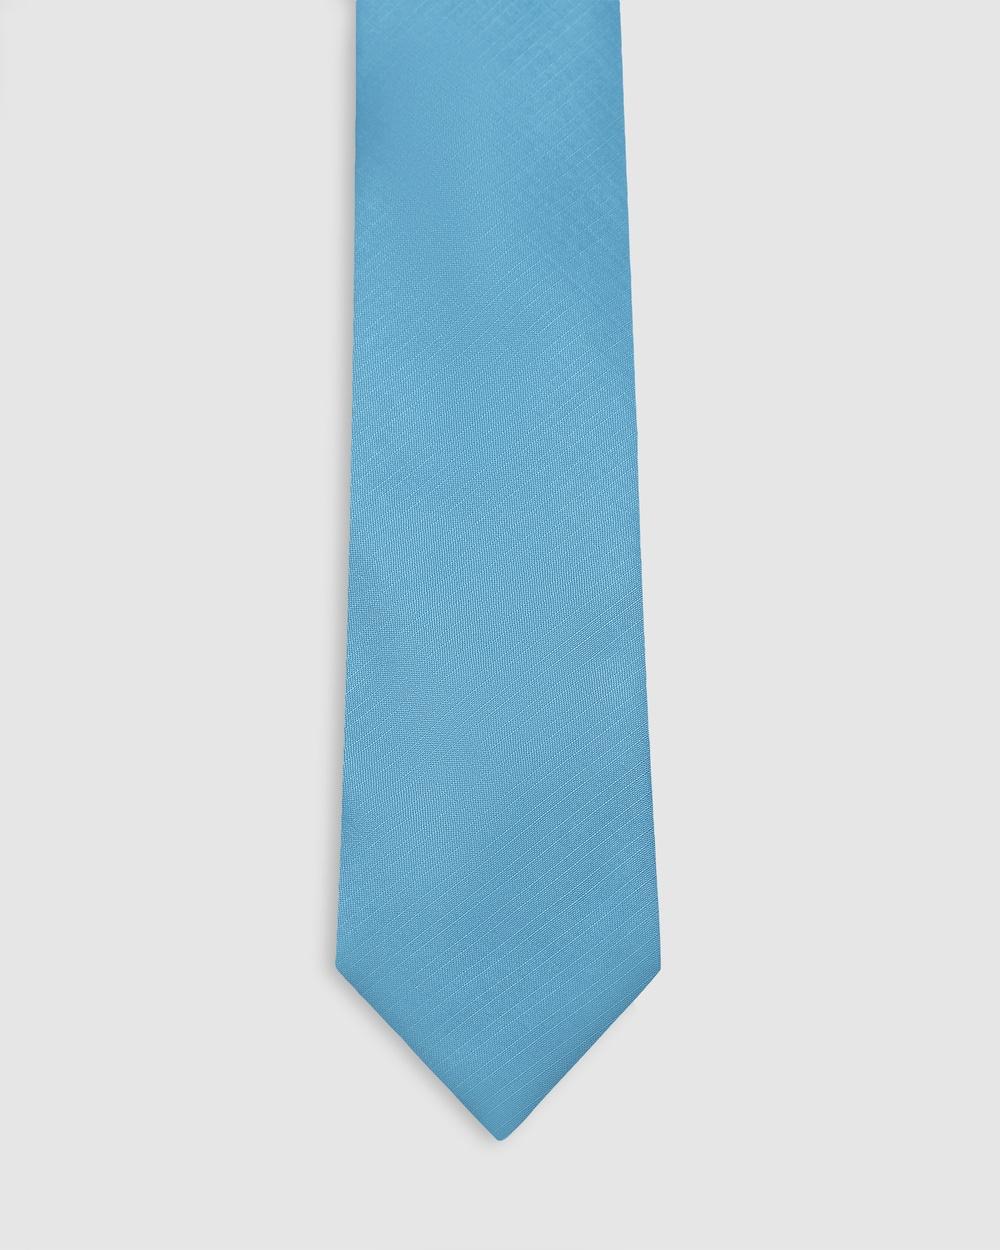 Buckle Plain Tie and Pocket Square Set Ties Aqua Australia